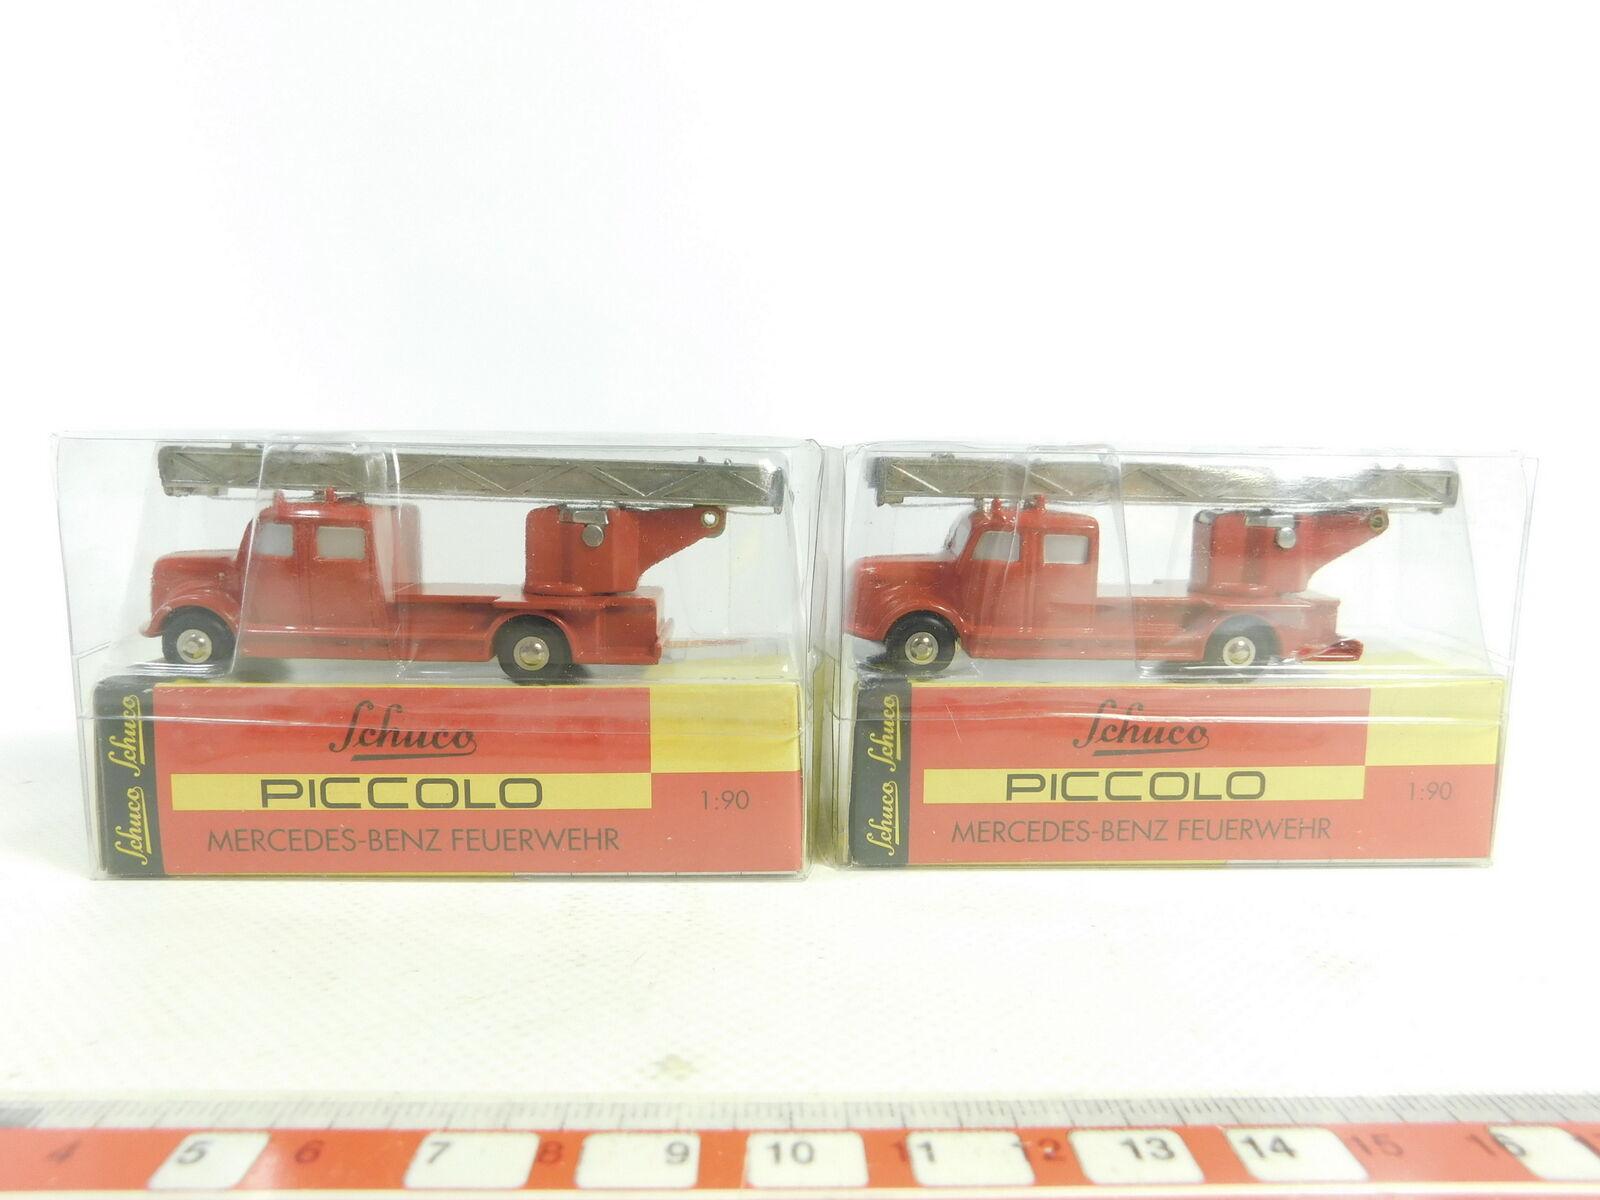 BD270-1x Schuco piccolo 1 90 01451 Mercedes-Benz MB Feuerwehr FW, NEUW+OVP